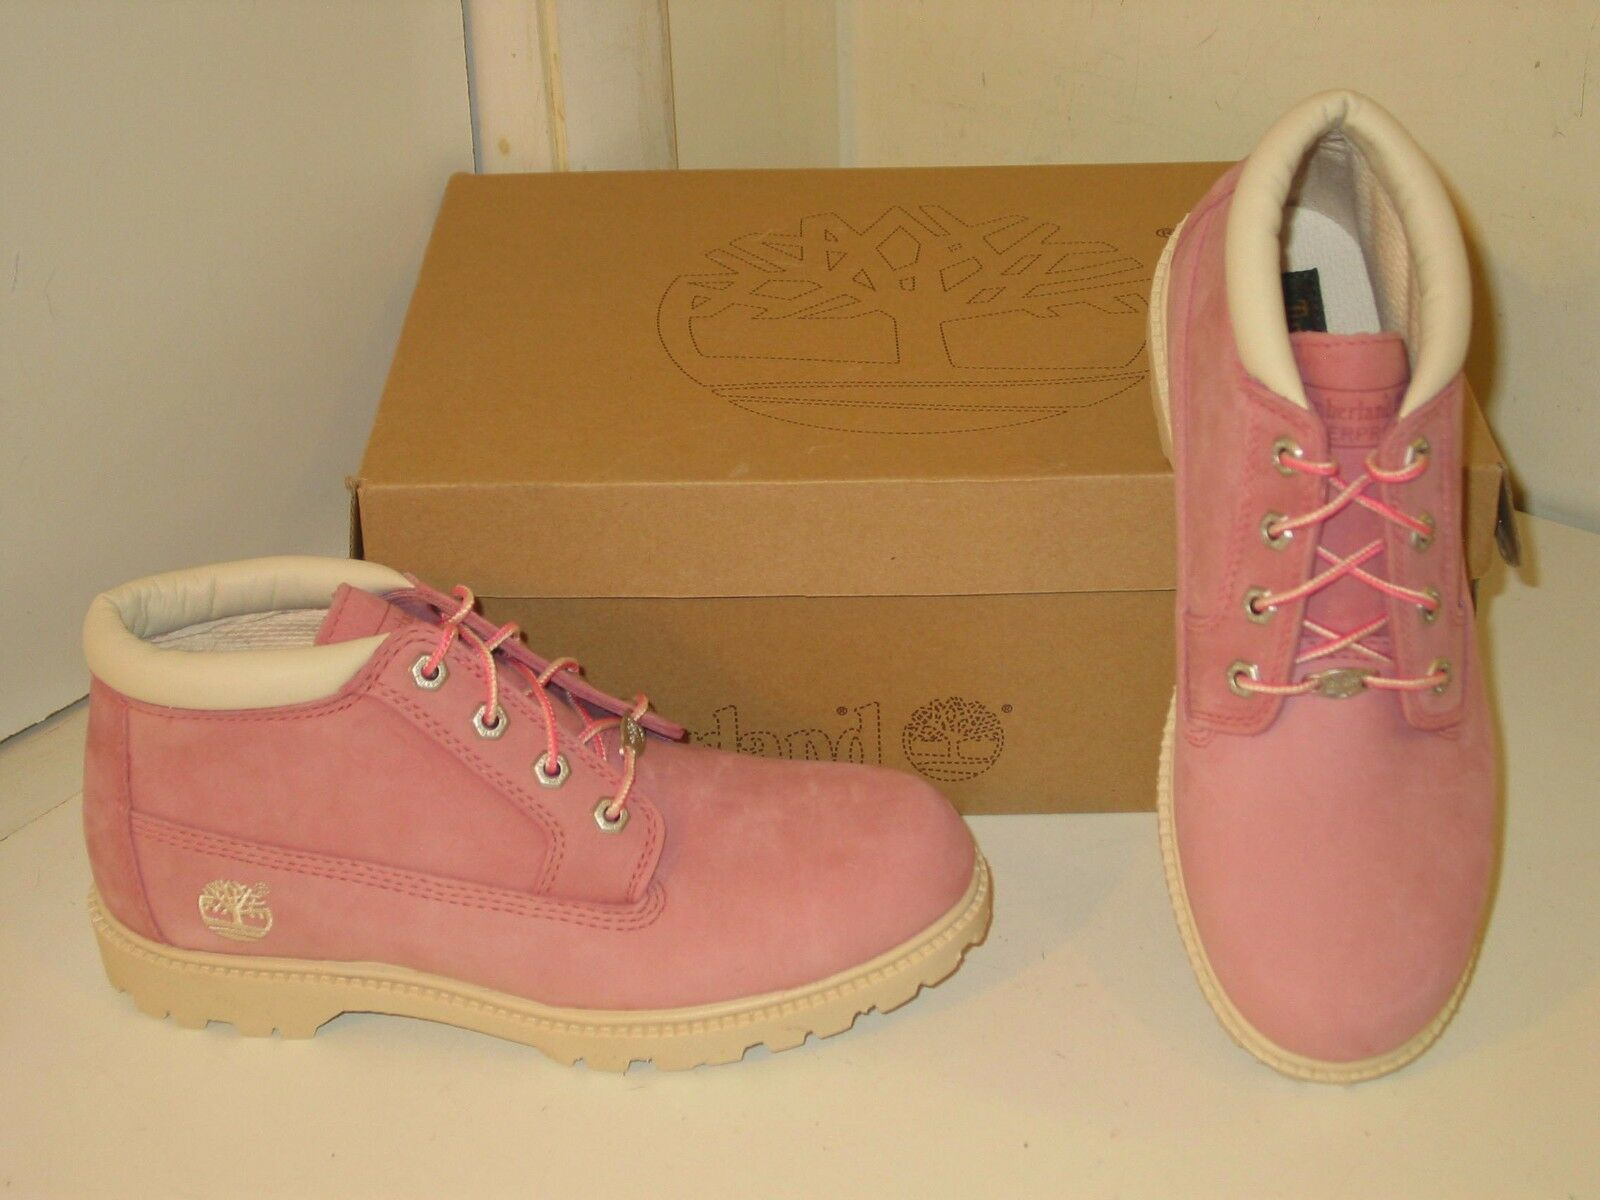 muy elogiado nueva llegada fotos nuevas Timberland Nellie Pink Waterproof Leather Chukka Boots Shoes ...